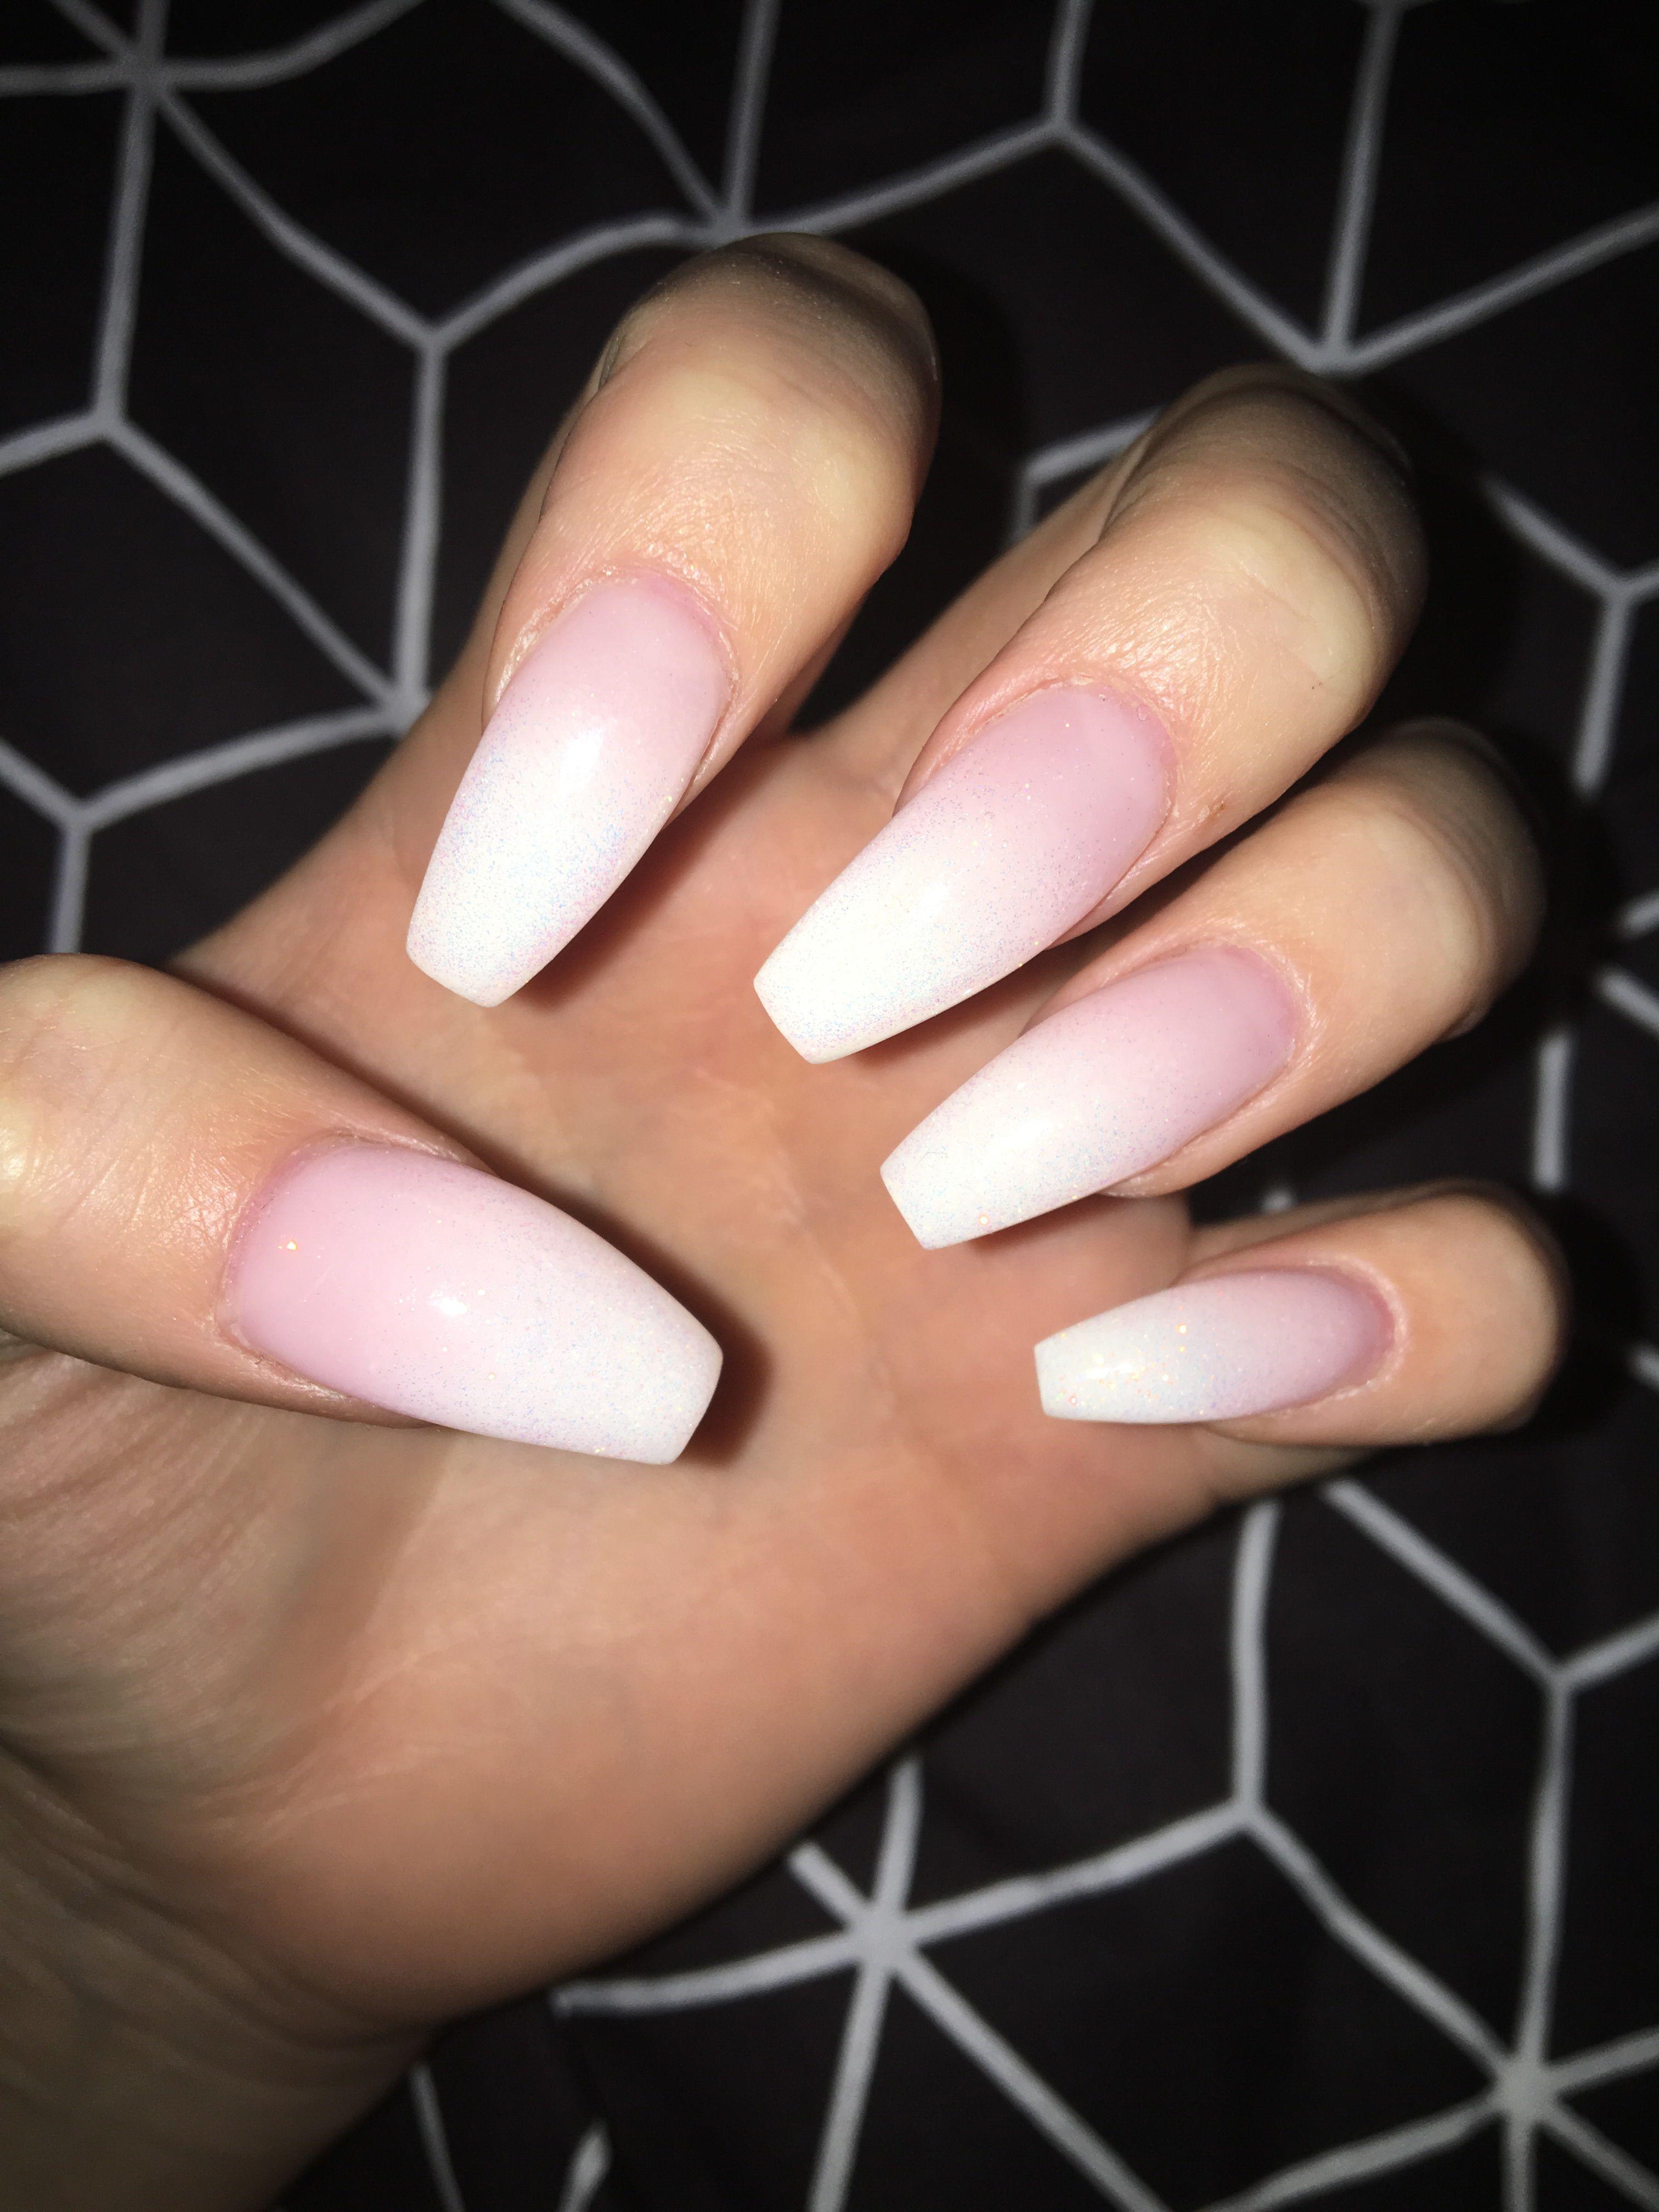 babyboomer gel nails manucure manicure white glitters